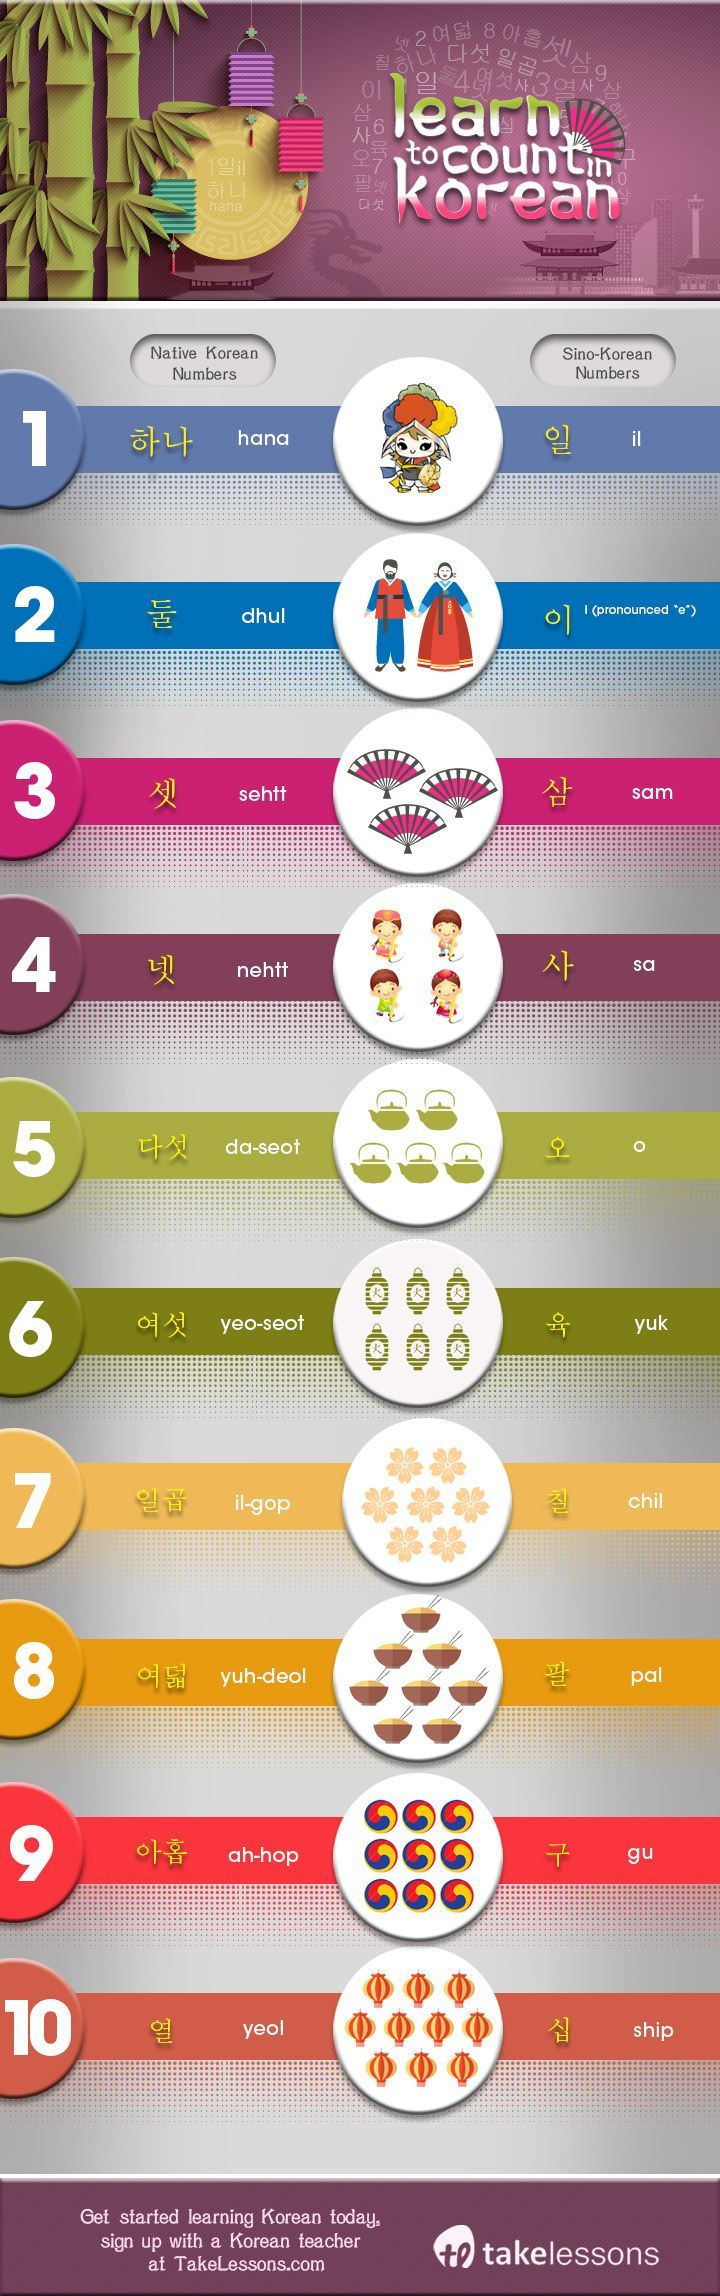 Counting in Korean: A Beginner's Guide to Korean Numbers